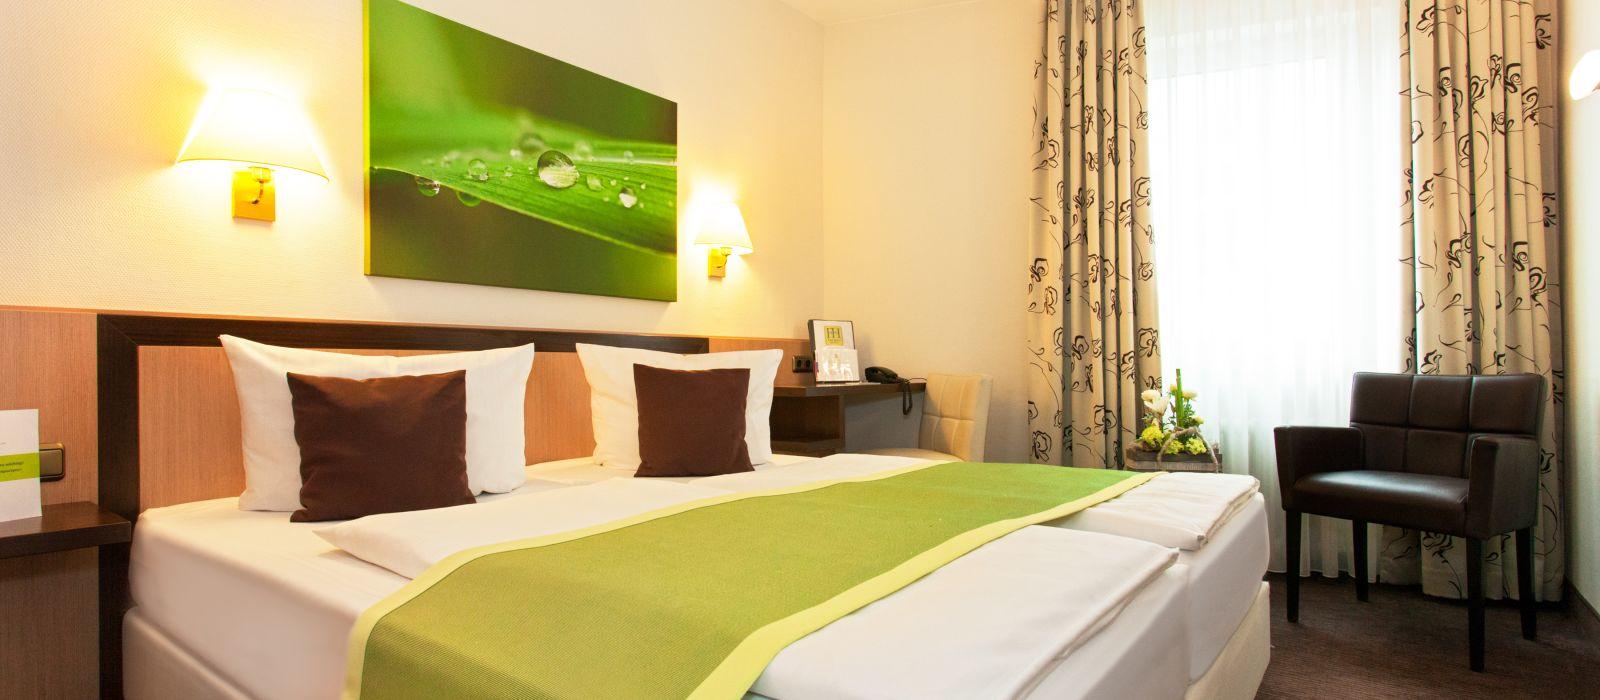 Favored Domicil Frankfurt Hotel In Germany Enchanting Travels